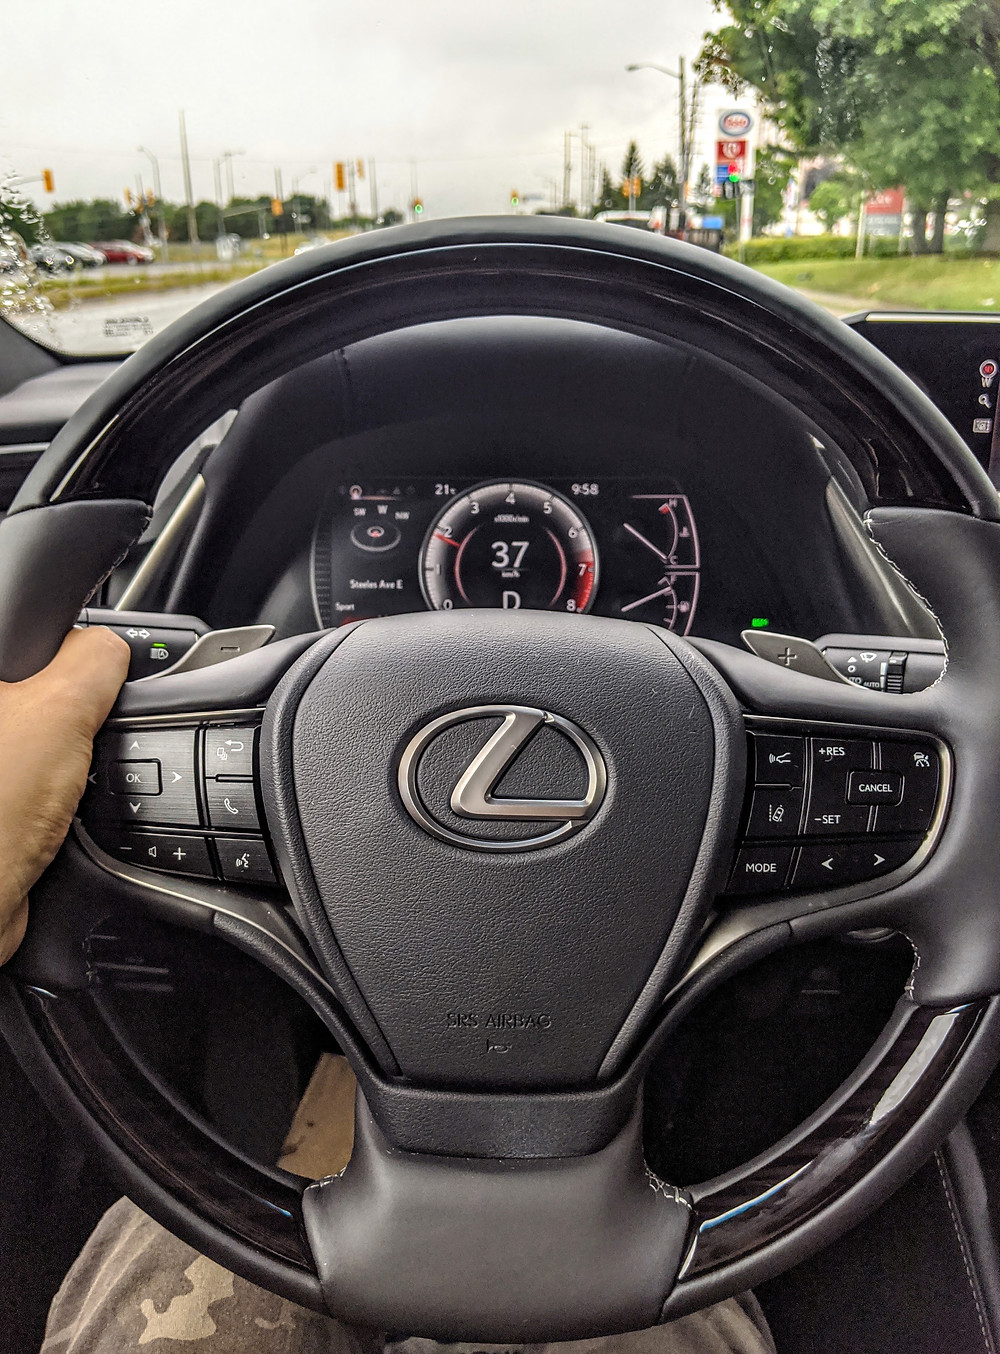 2020 Lexus ES 350 Steering Wheel POV